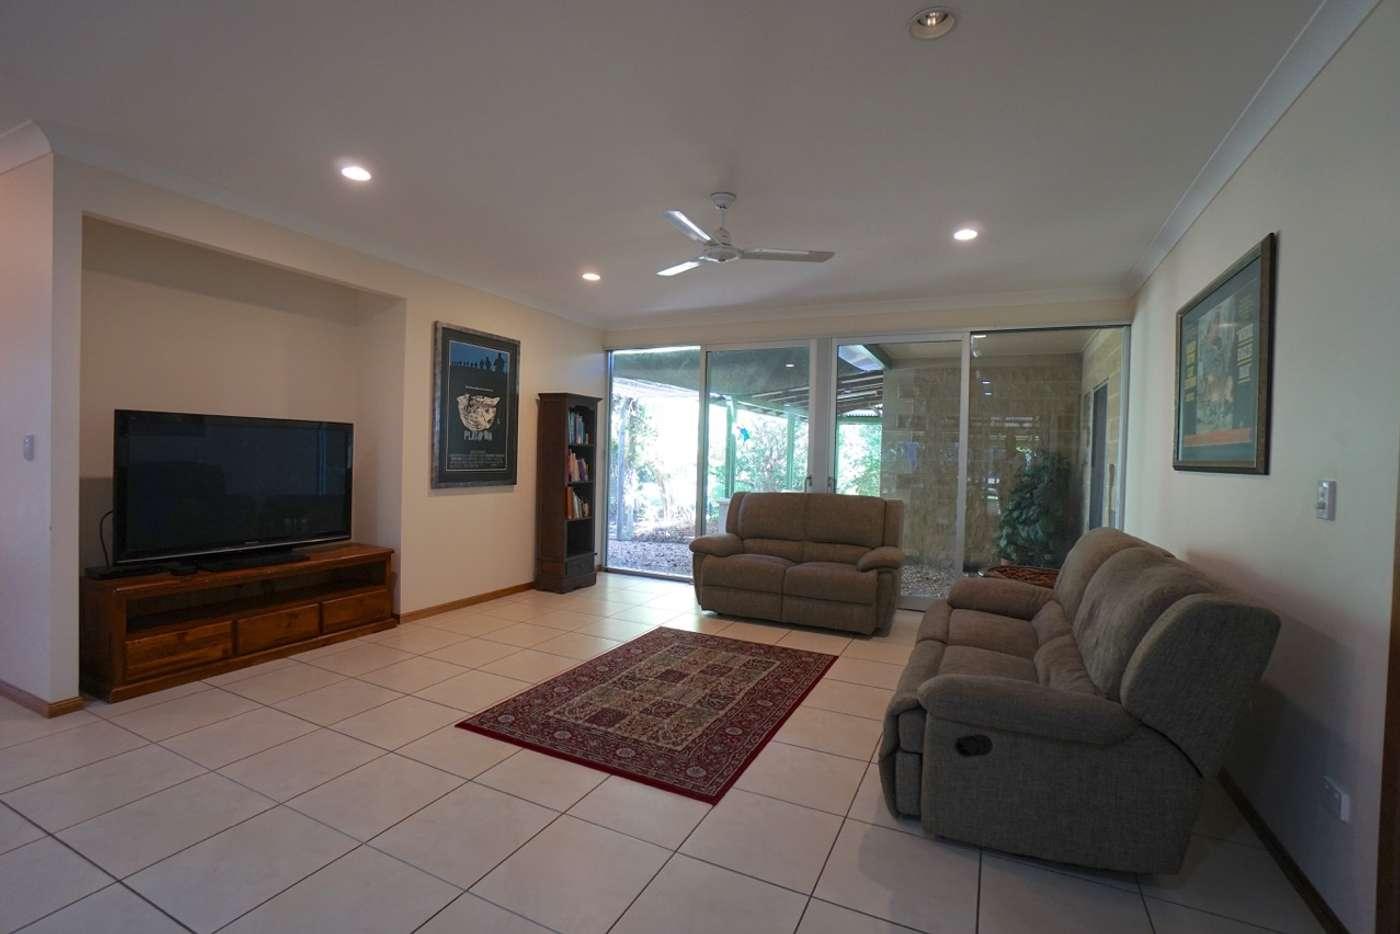 Sixth view of Homely house listing, 27 Shaban Close, Mareeba QLD 4880